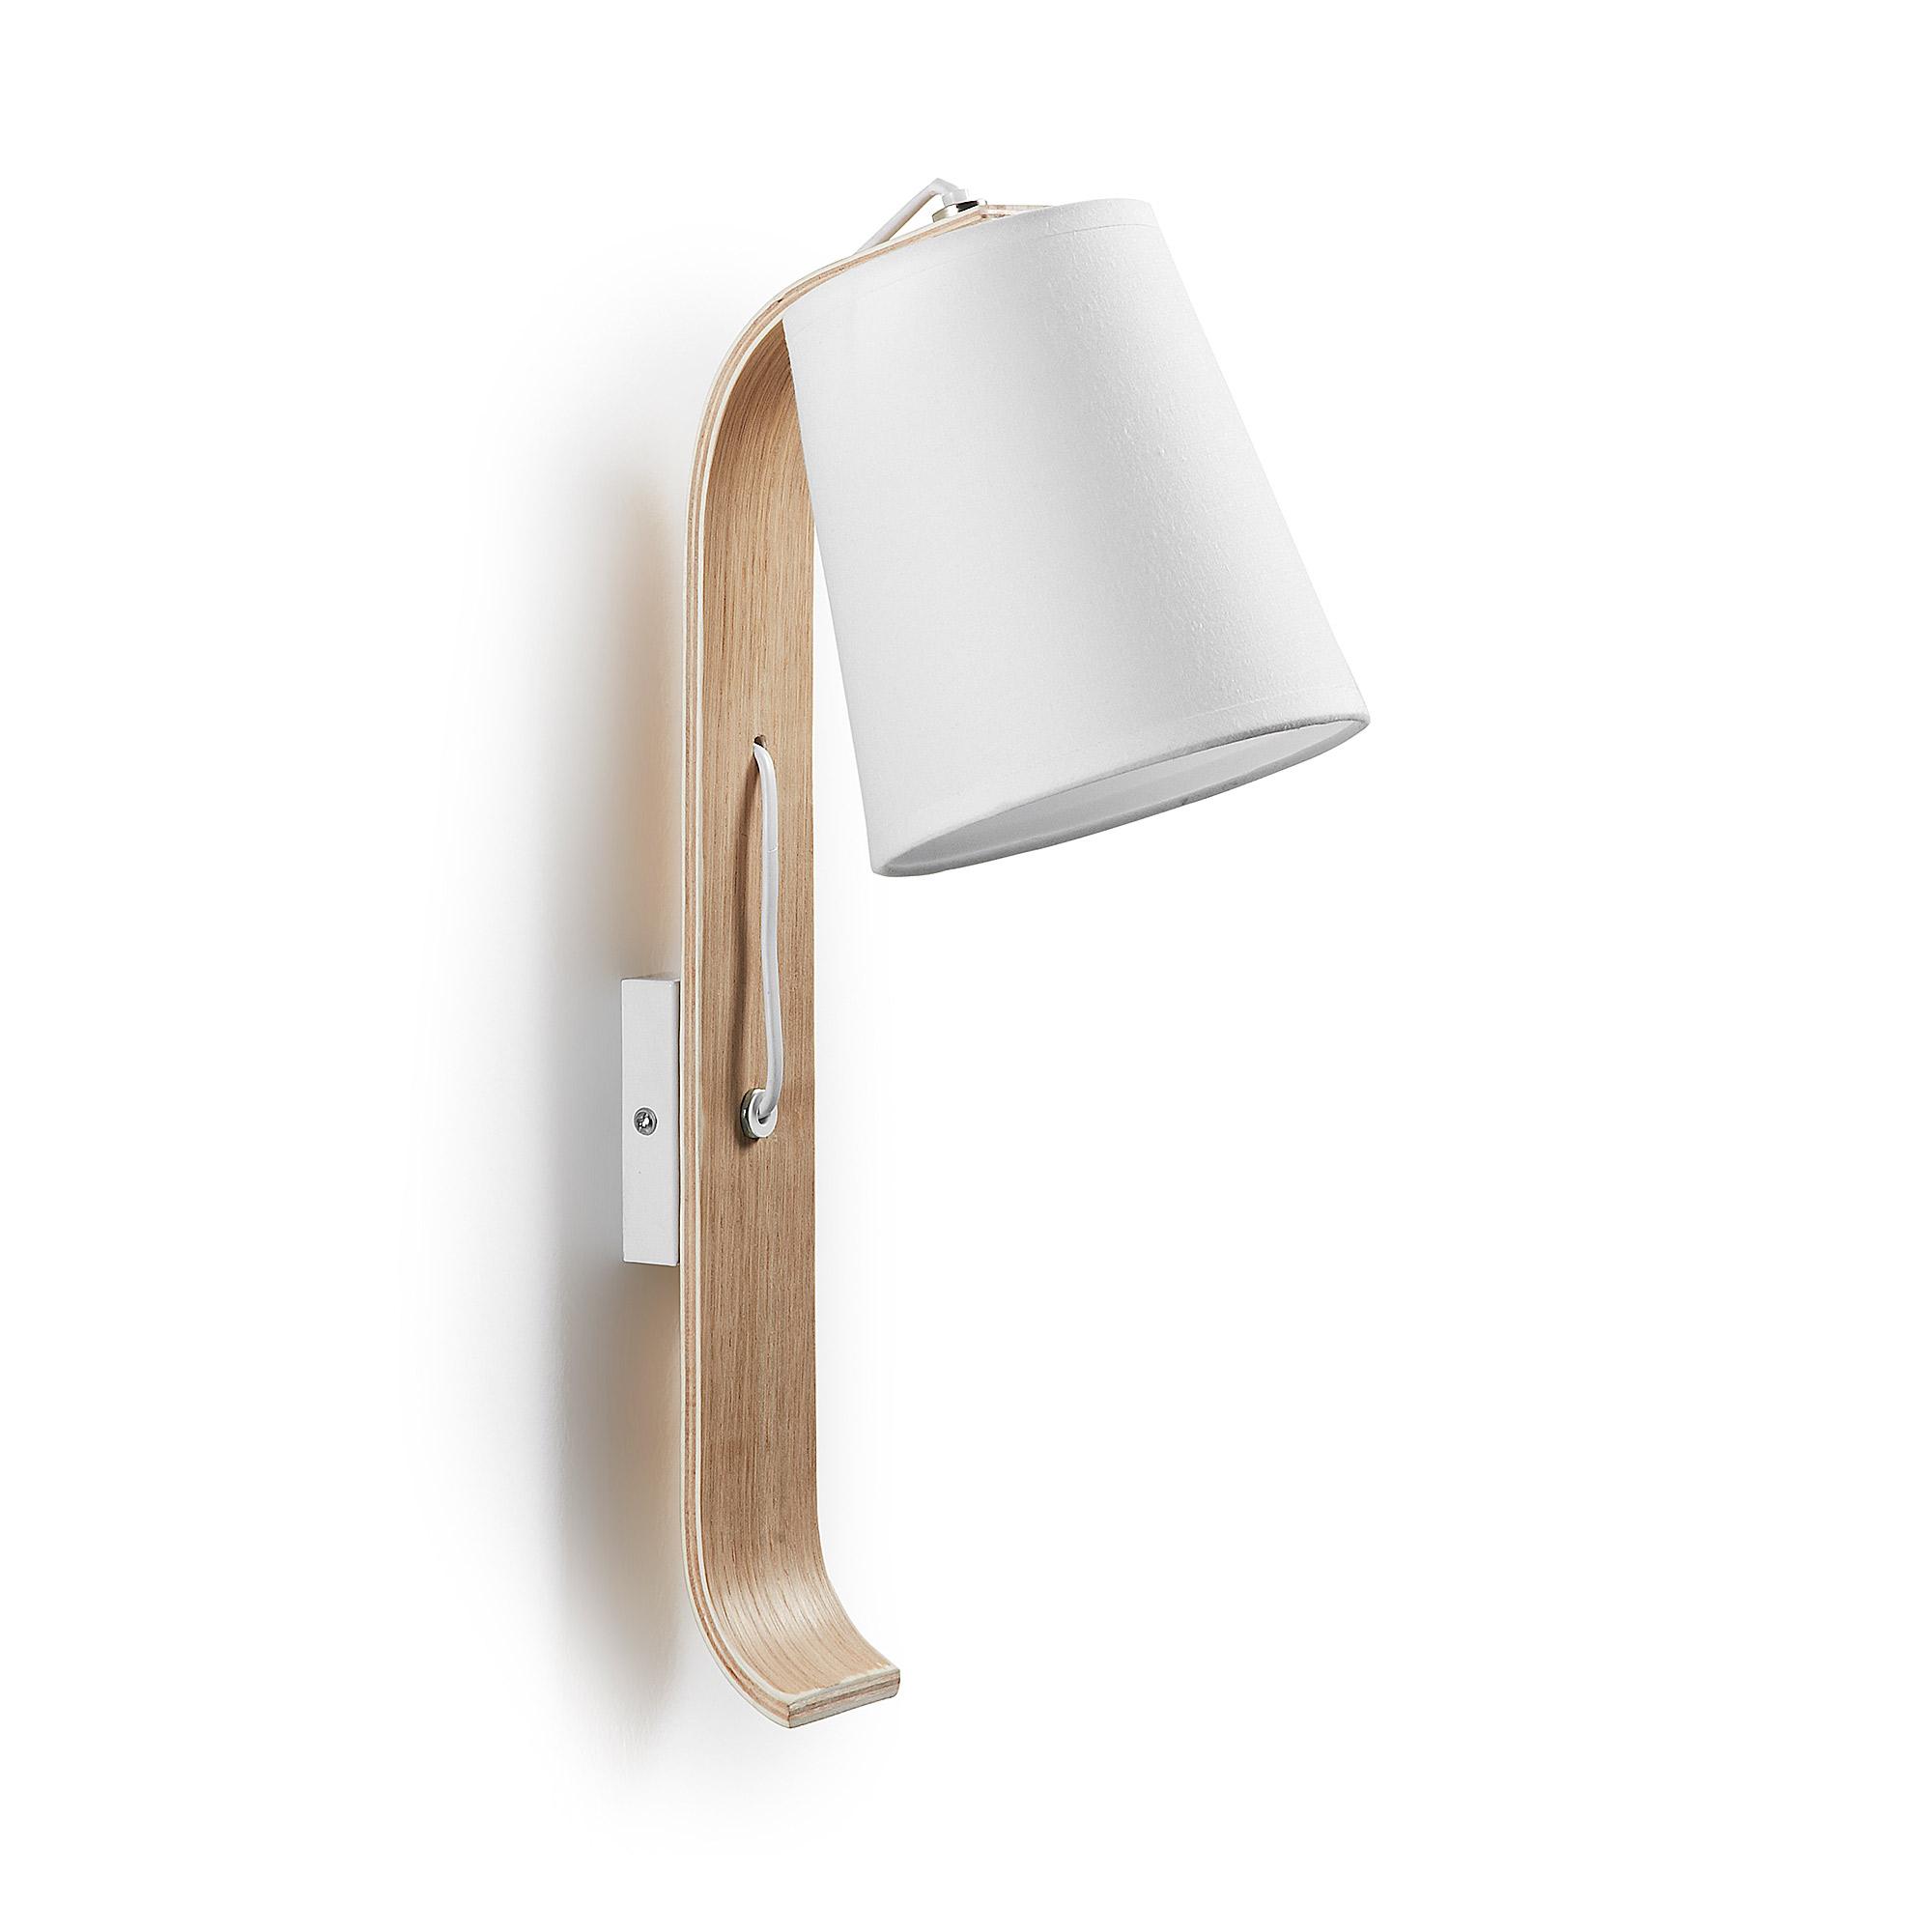 Kave Home wandlamp 'Repcy', kleur wit